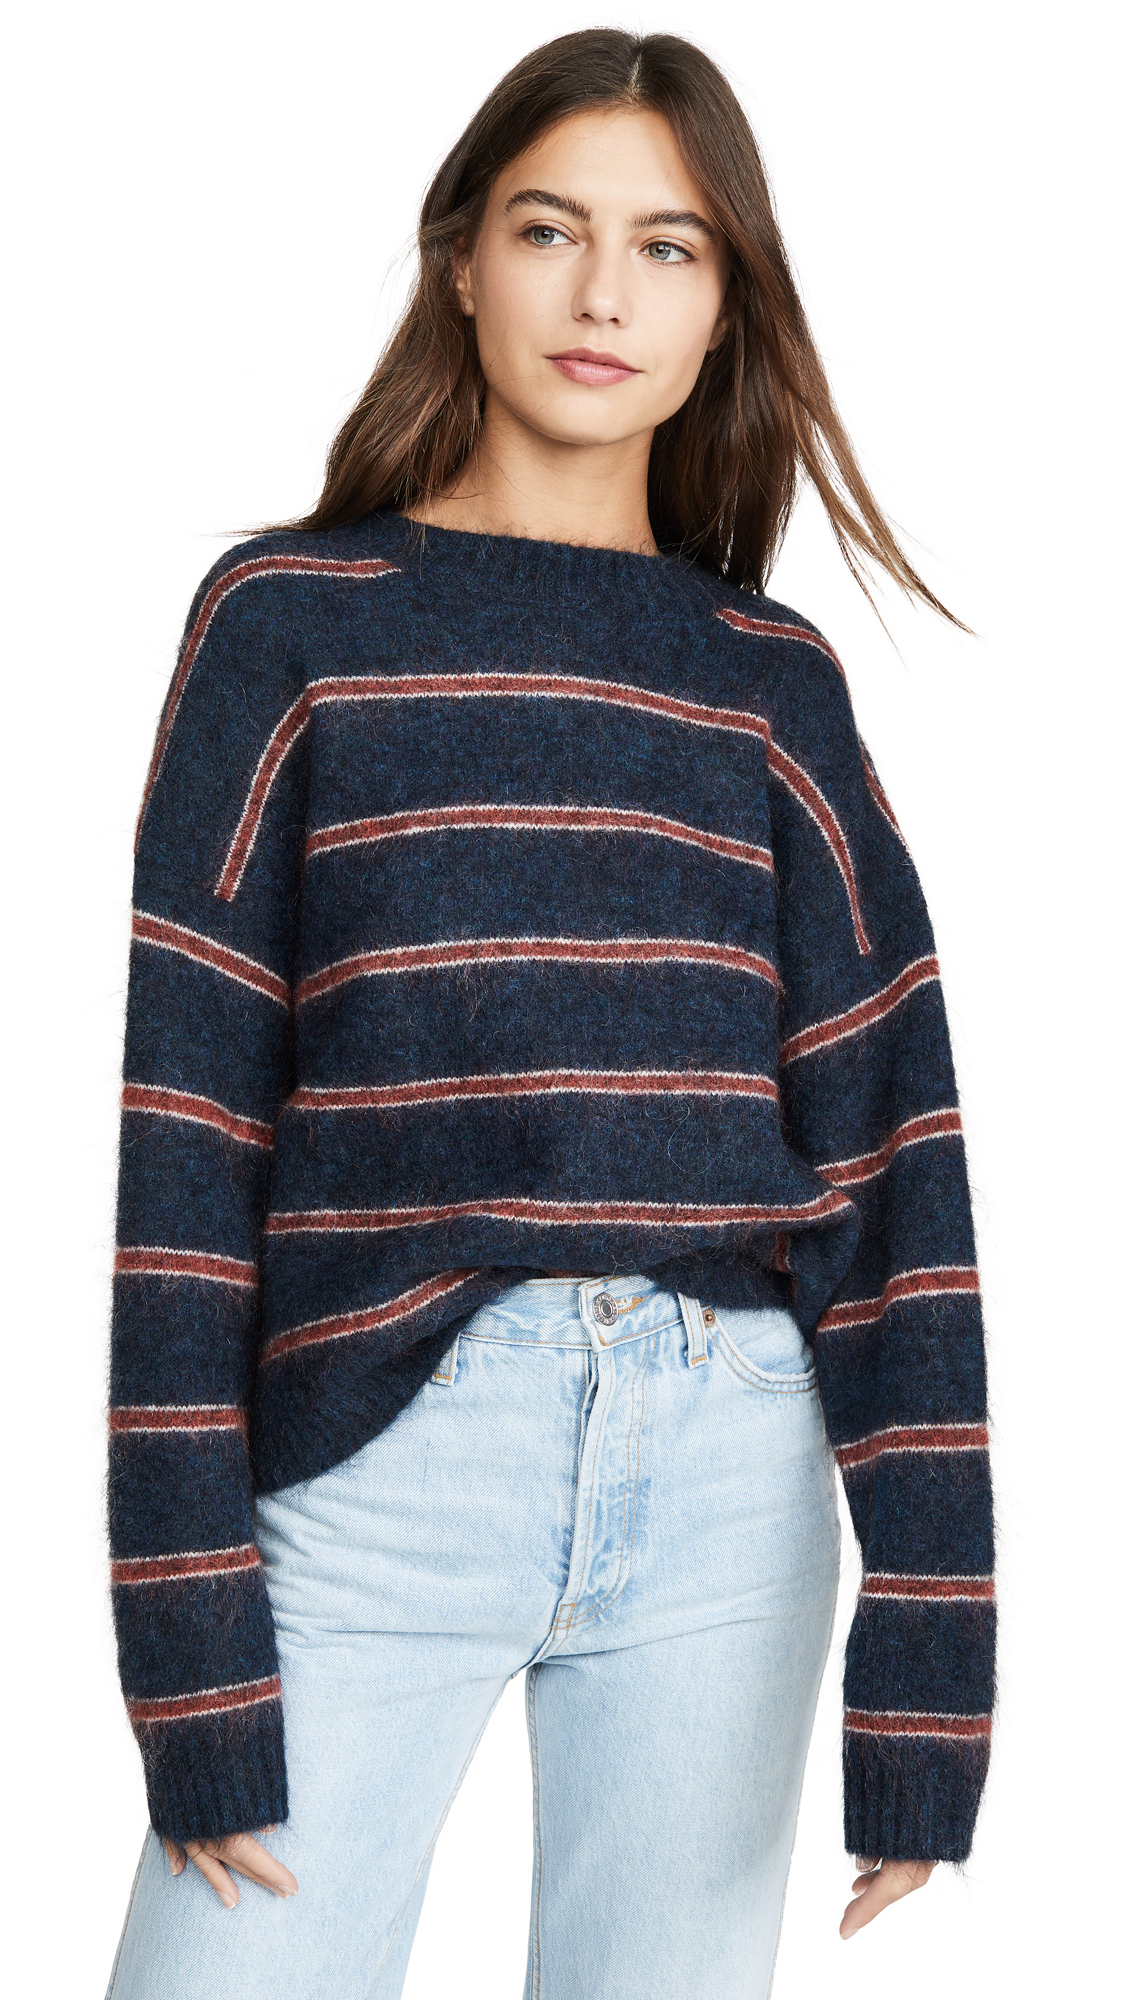 Acne Studios Khira Moh Knitwear Sweater - Petrol/Red